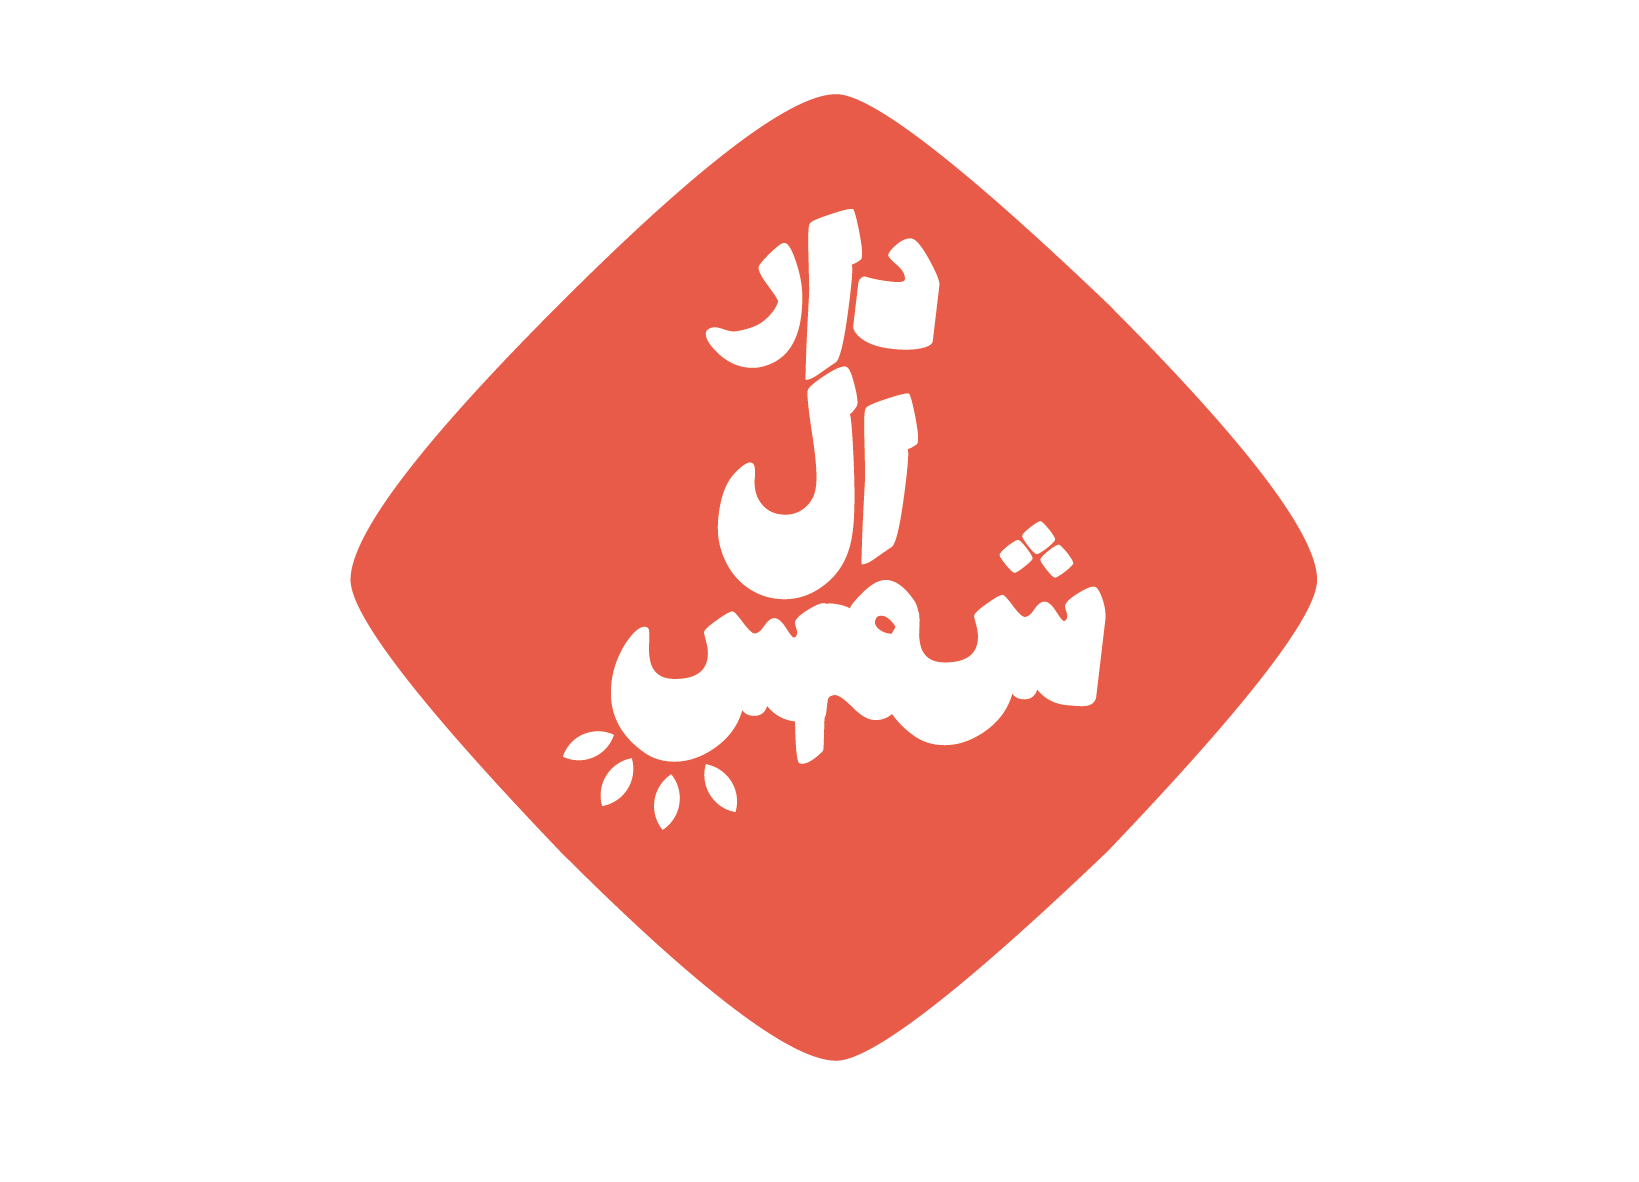 logo_Dar al Shams_final-14.png